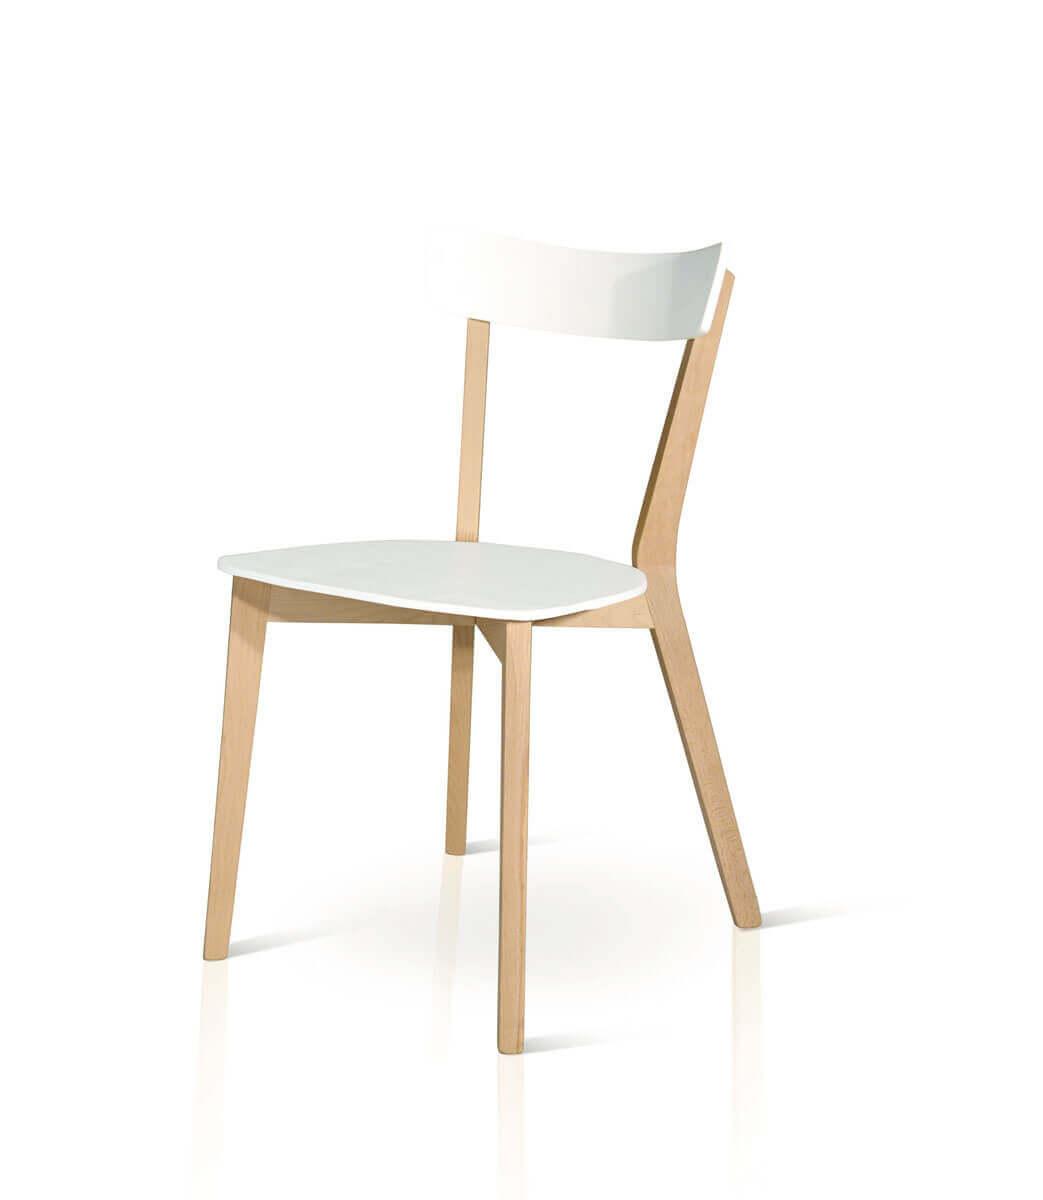 Sedie Bianche In Offerta.Sedie In Legno Design Minimal In Offerta Spazio Casa Sendero Deals